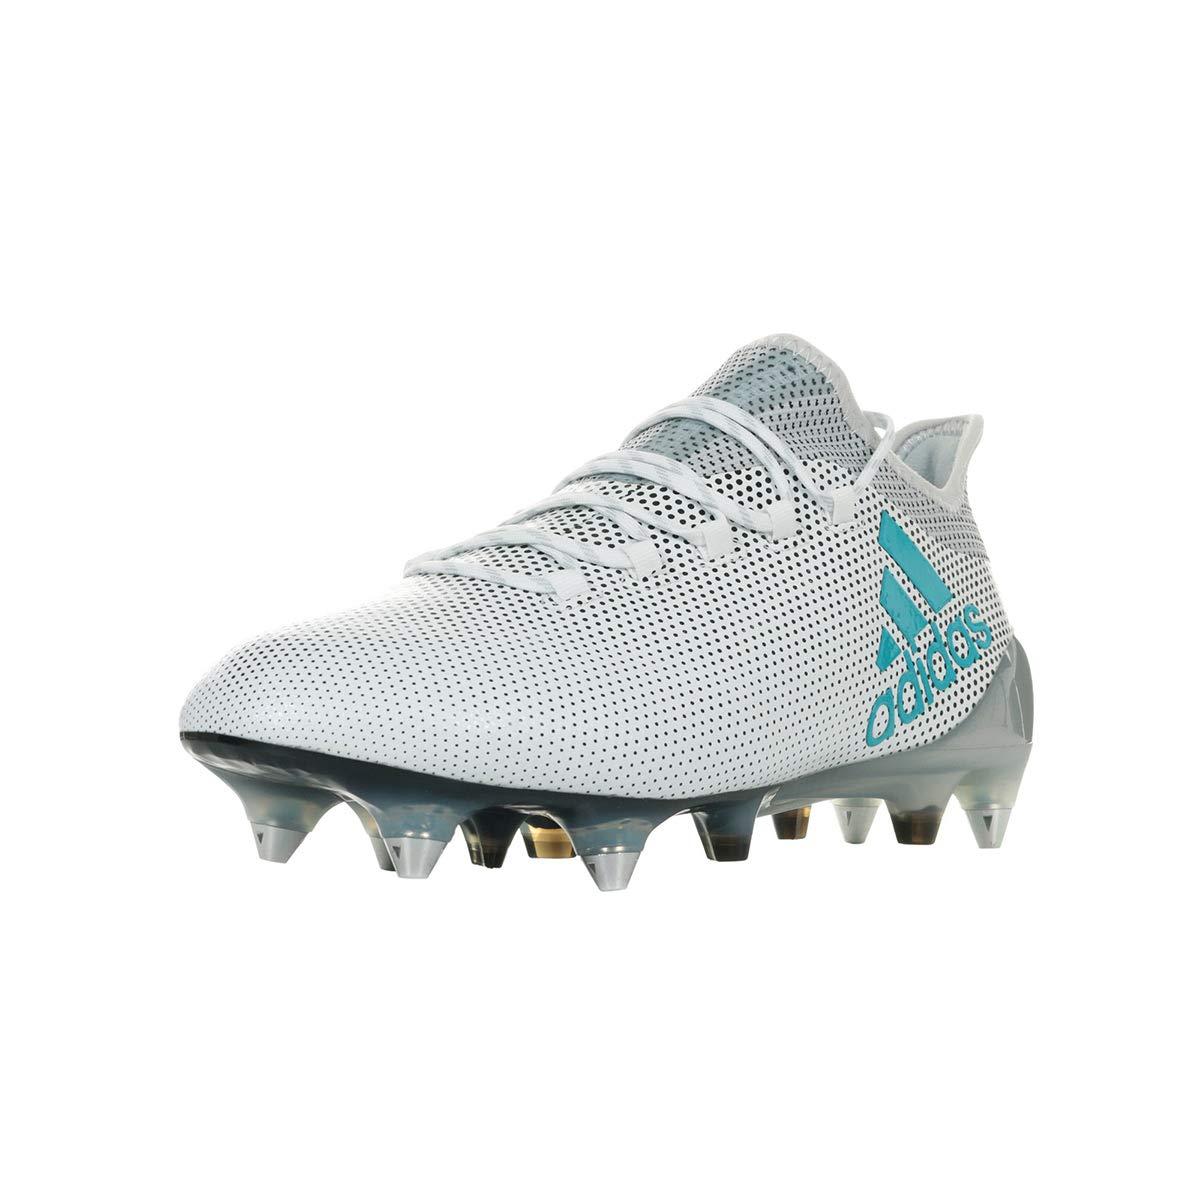 ADIDAS X 17.1 SG S82315, Fußballschuhe